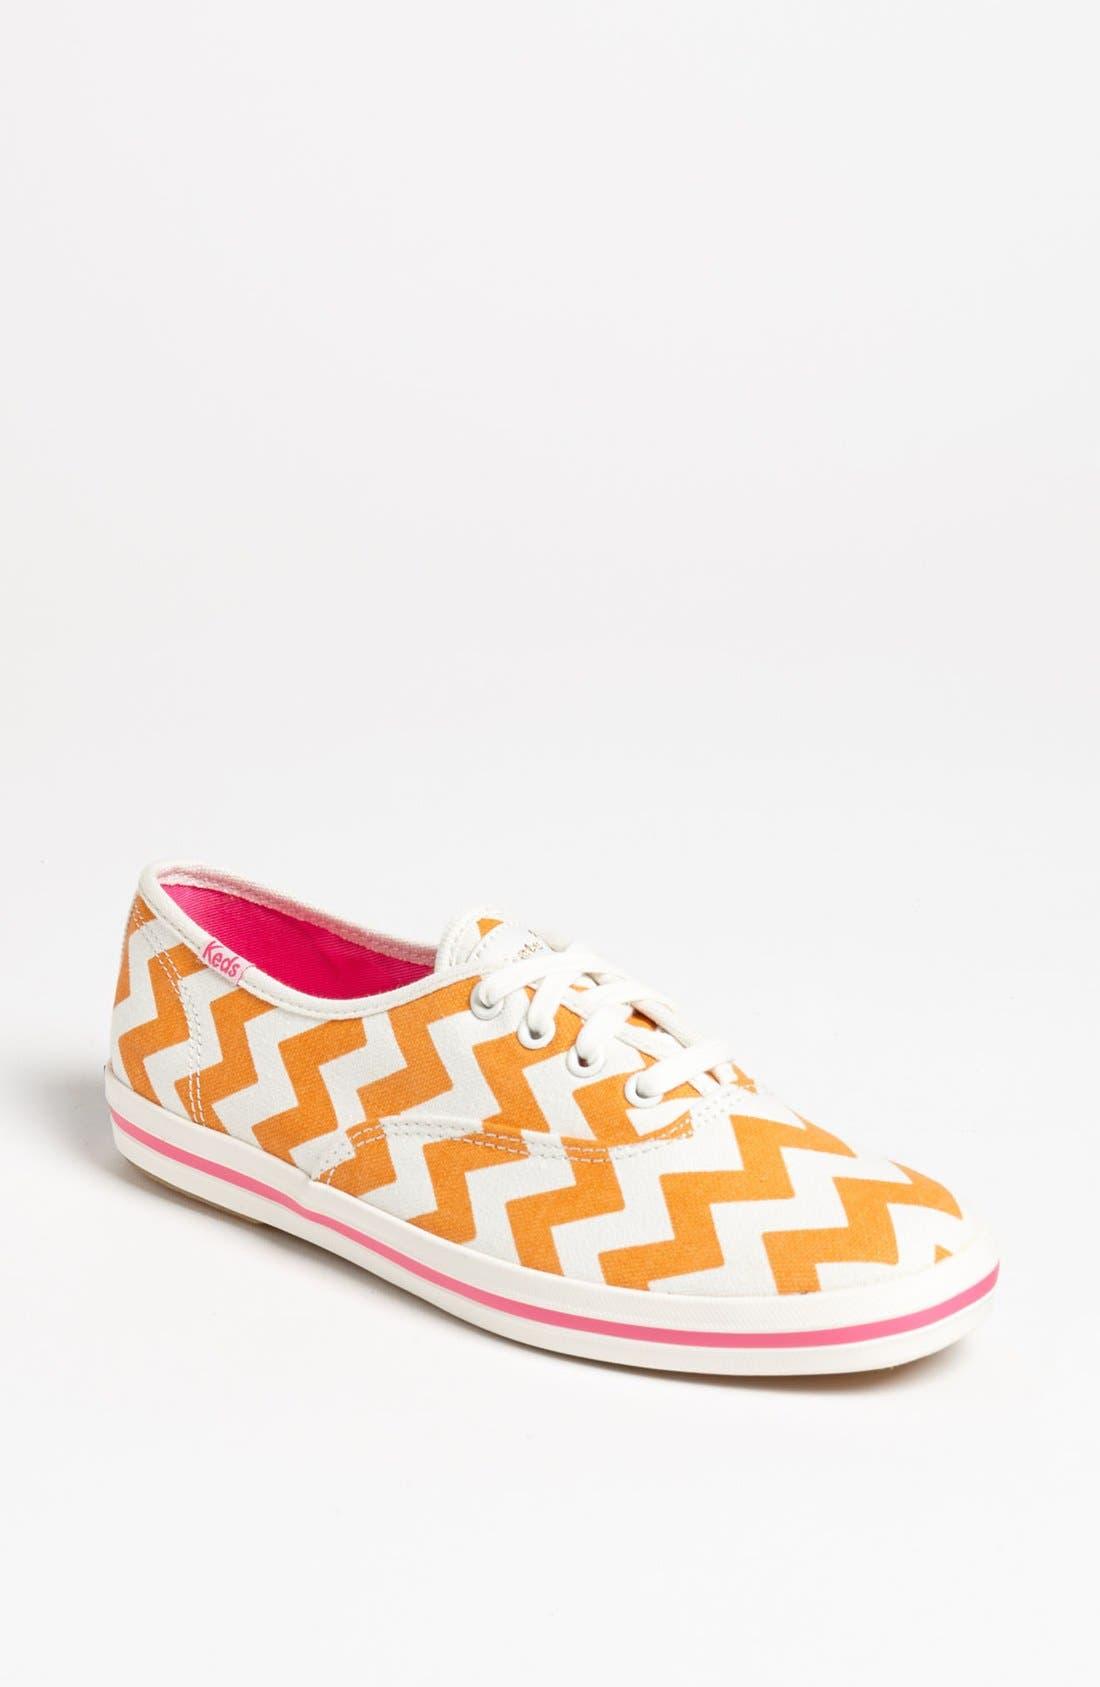 Keds<sup>®</sup> for kate spade new york 'kick' sneaker,                             Main thumbnail 4, color,